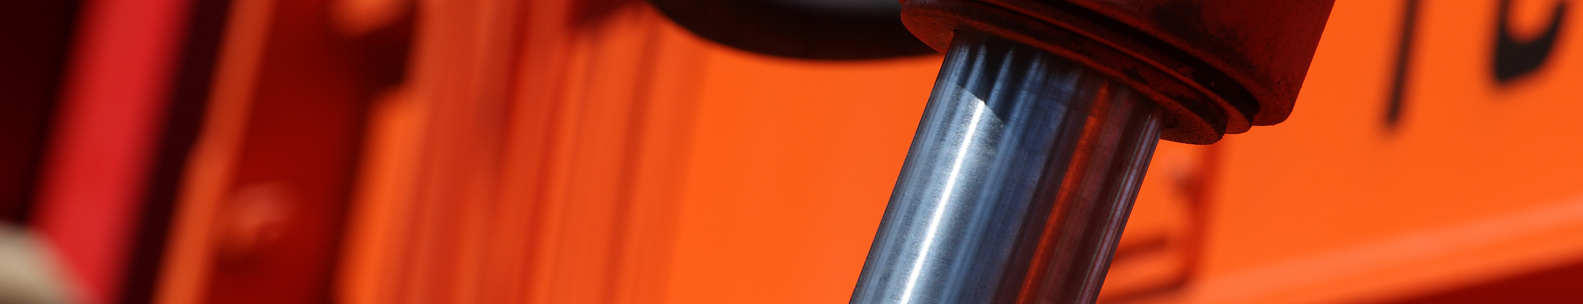 Pneumatika  Pažangūs, aukštos kokybės pneumatikos įrengimai